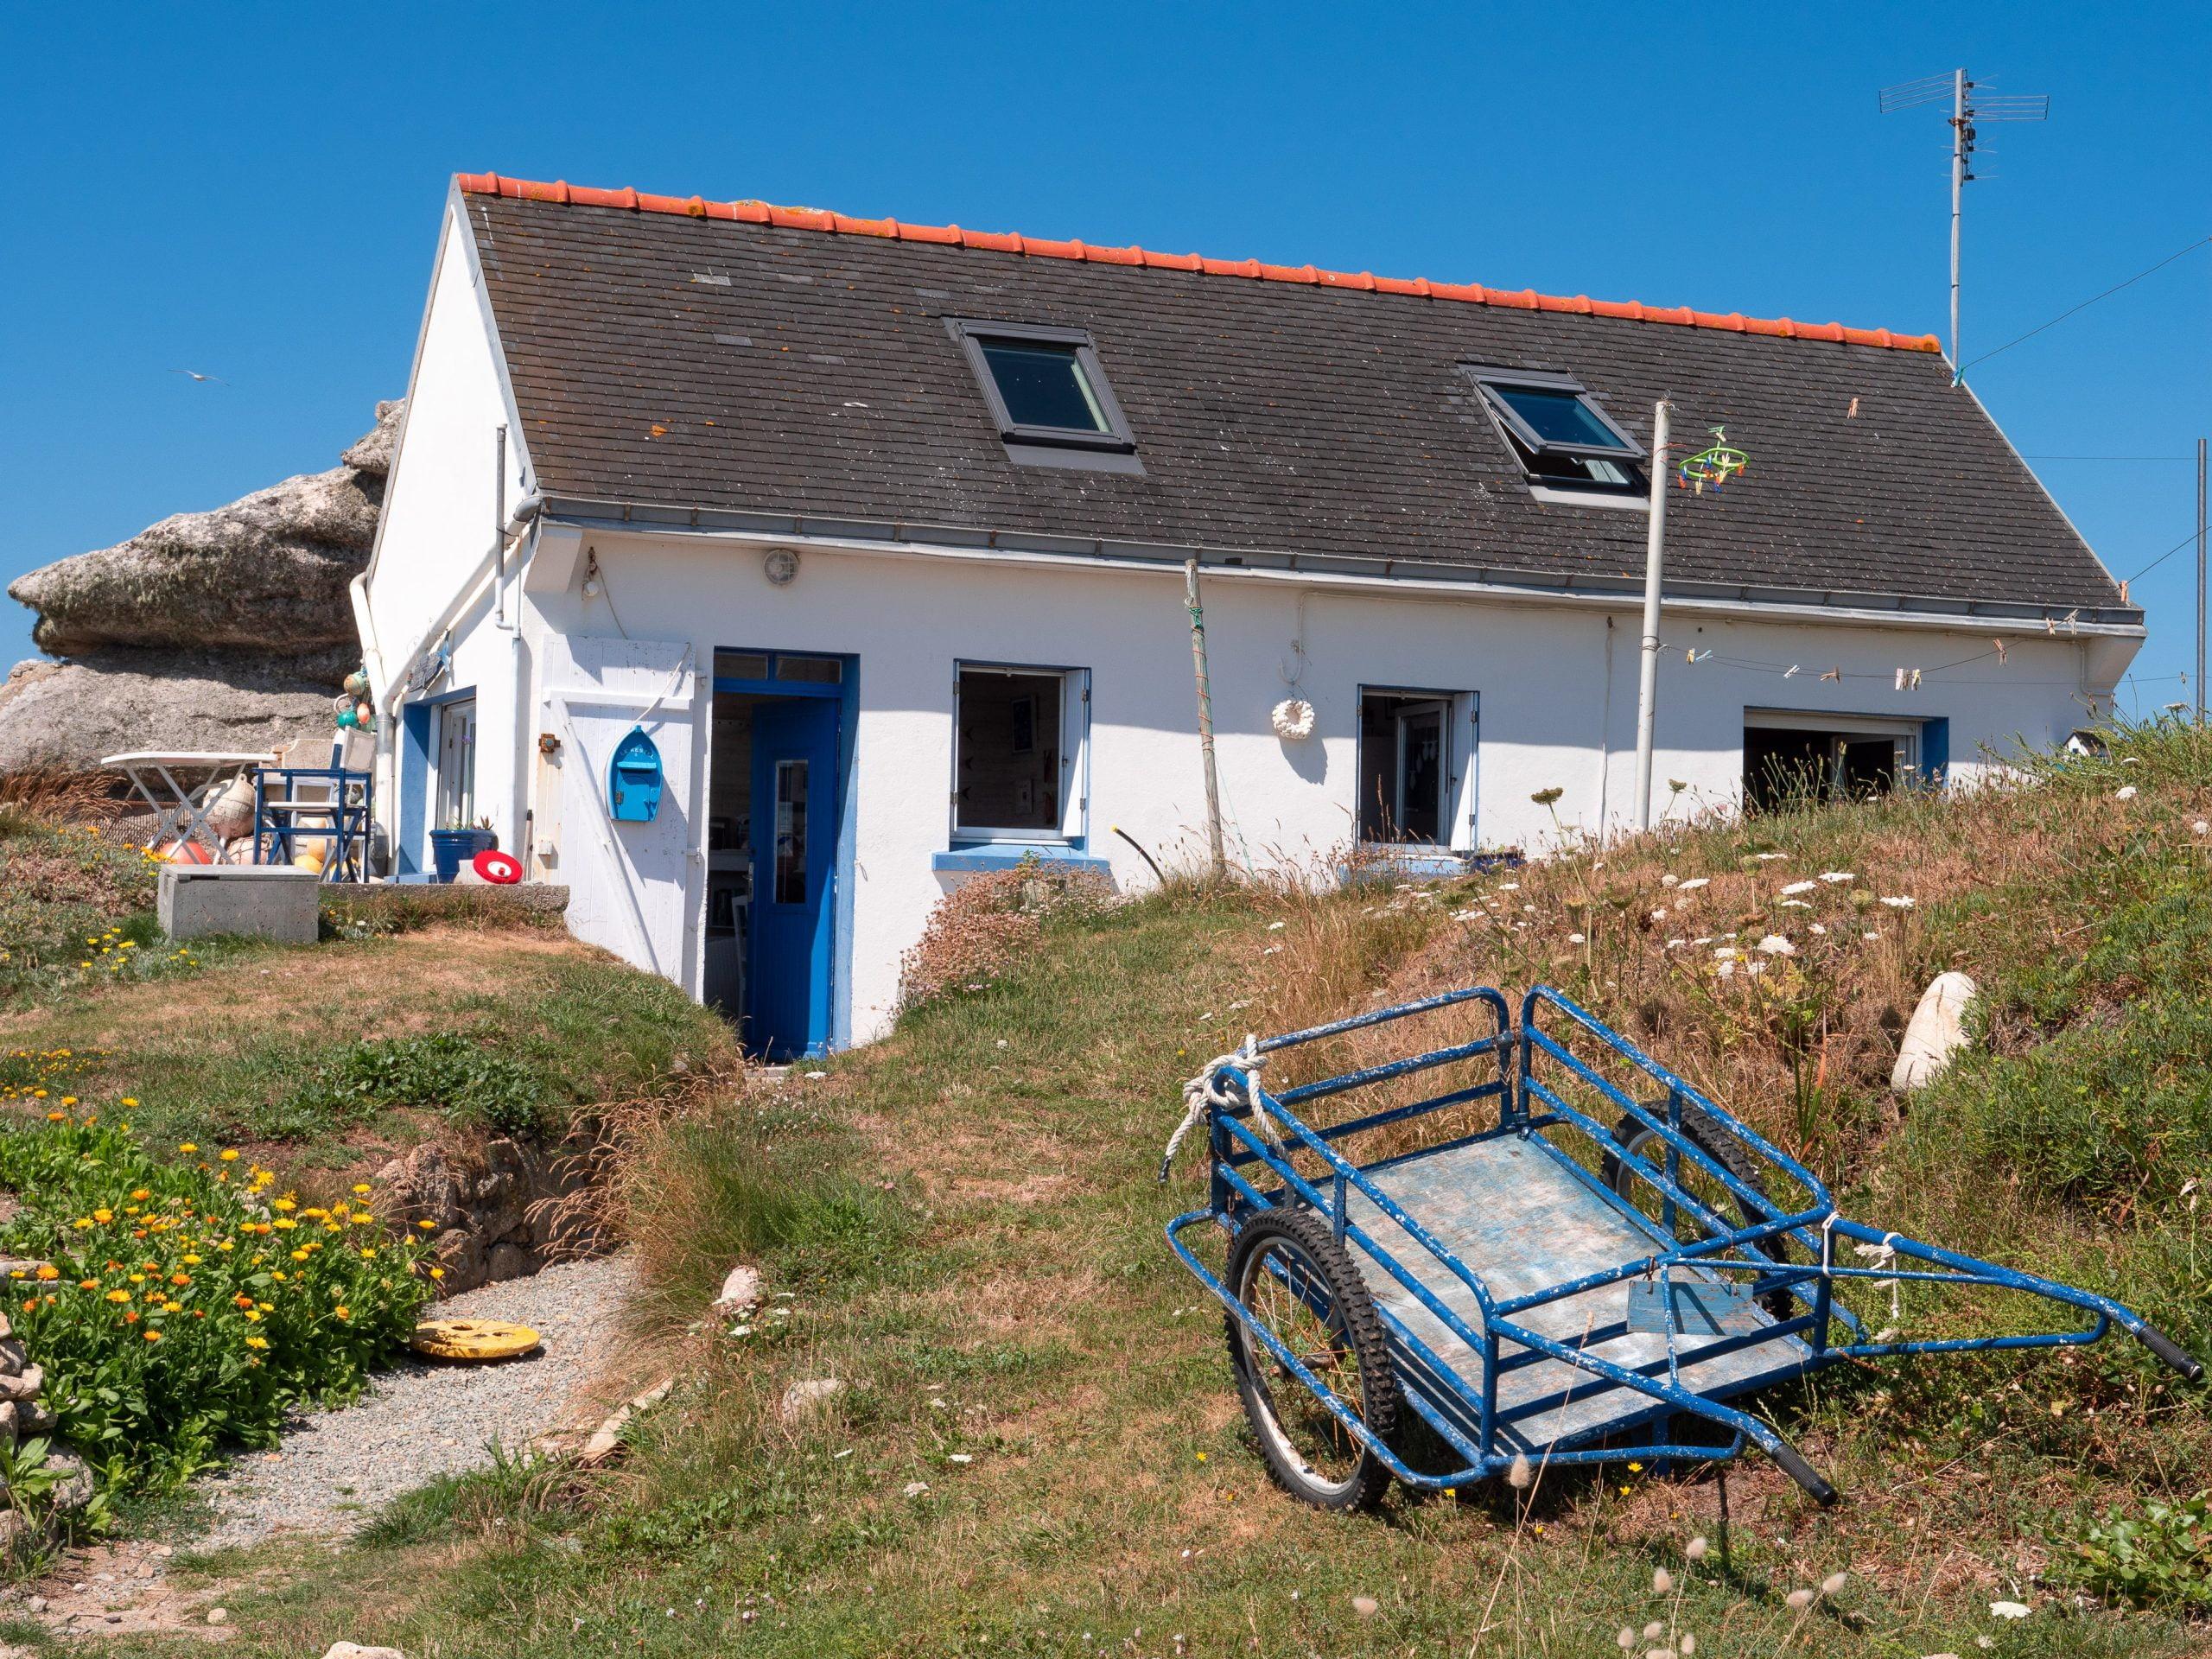 Sein maison carriole scaled - Les globe blogueurs - blog voyage nature